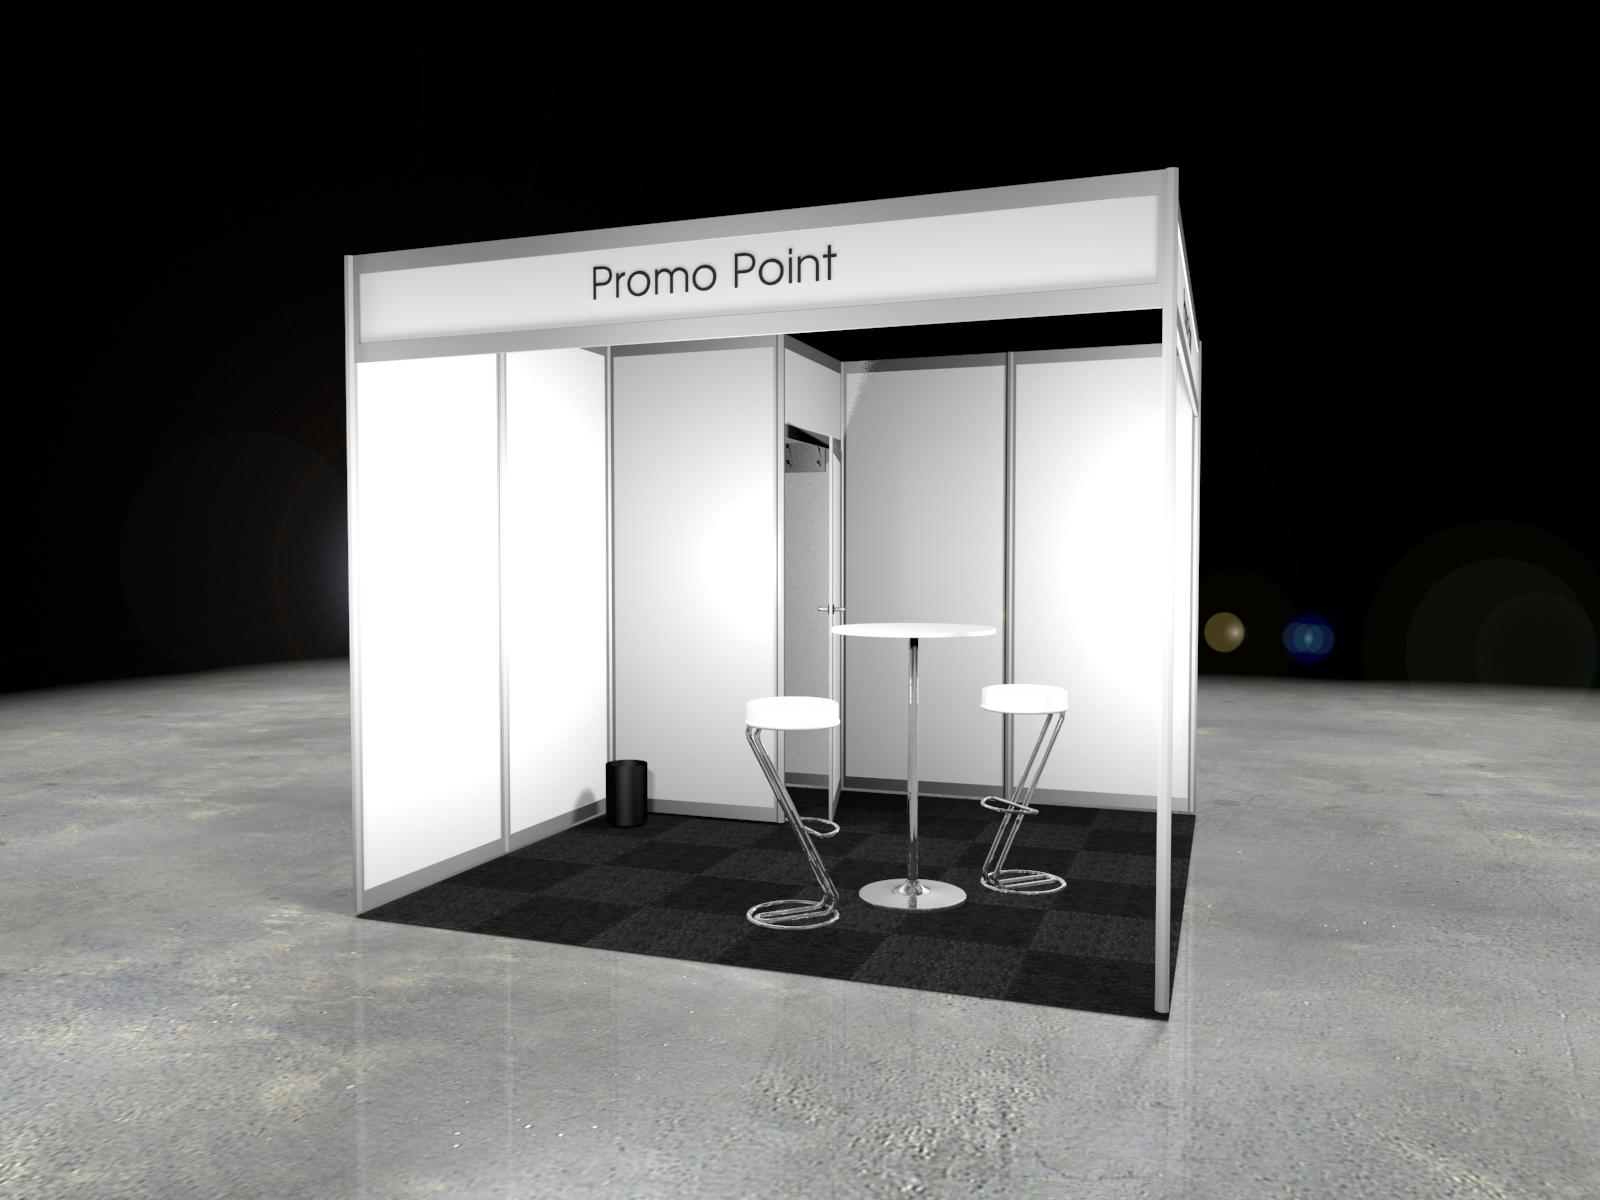 promo-point-1.jpg